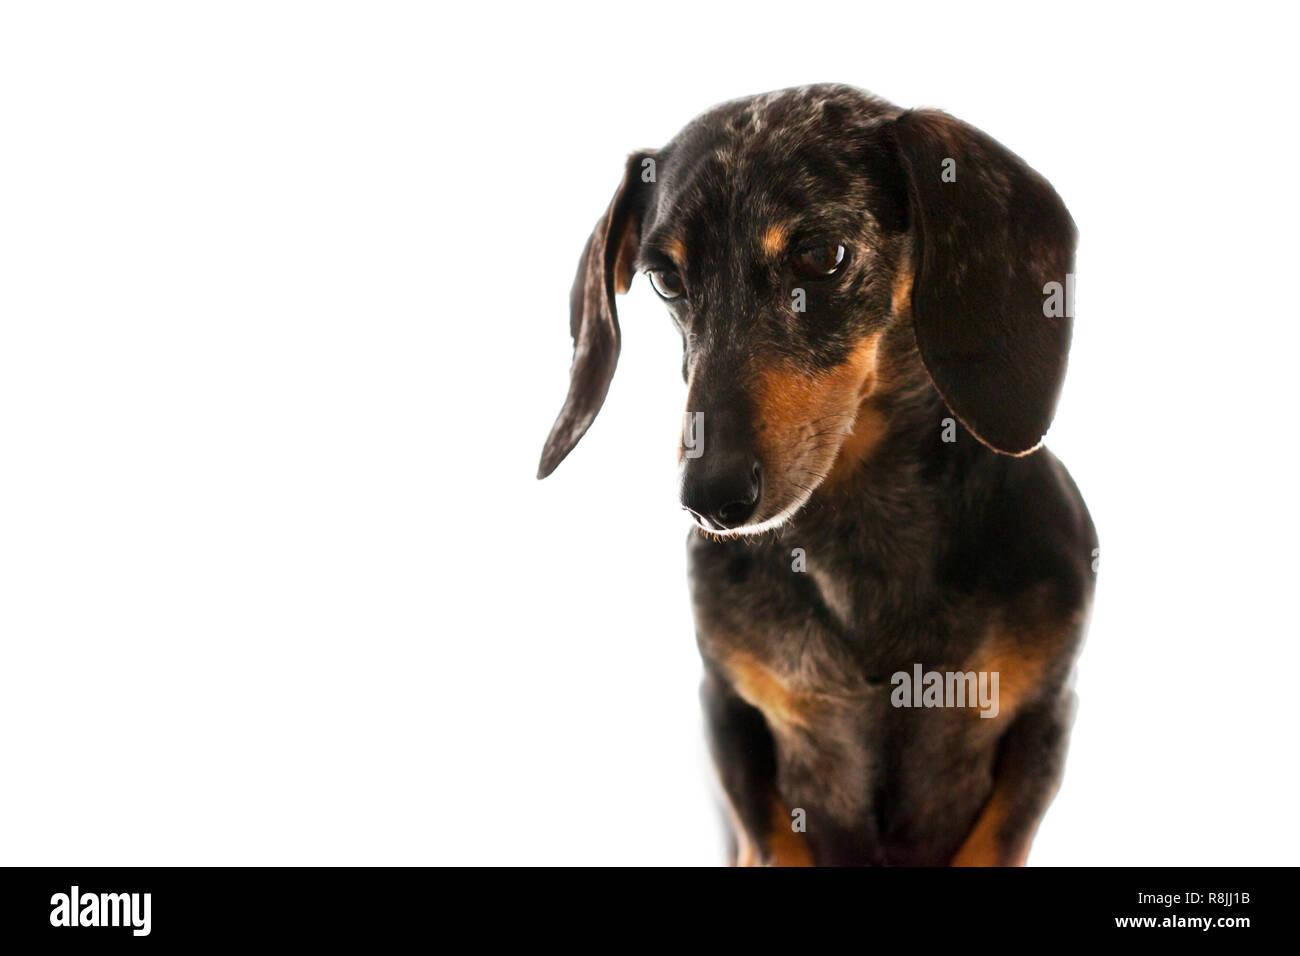 Senior Miniature Black and Tan Dapple Dachshund with White Background. - Stock Image